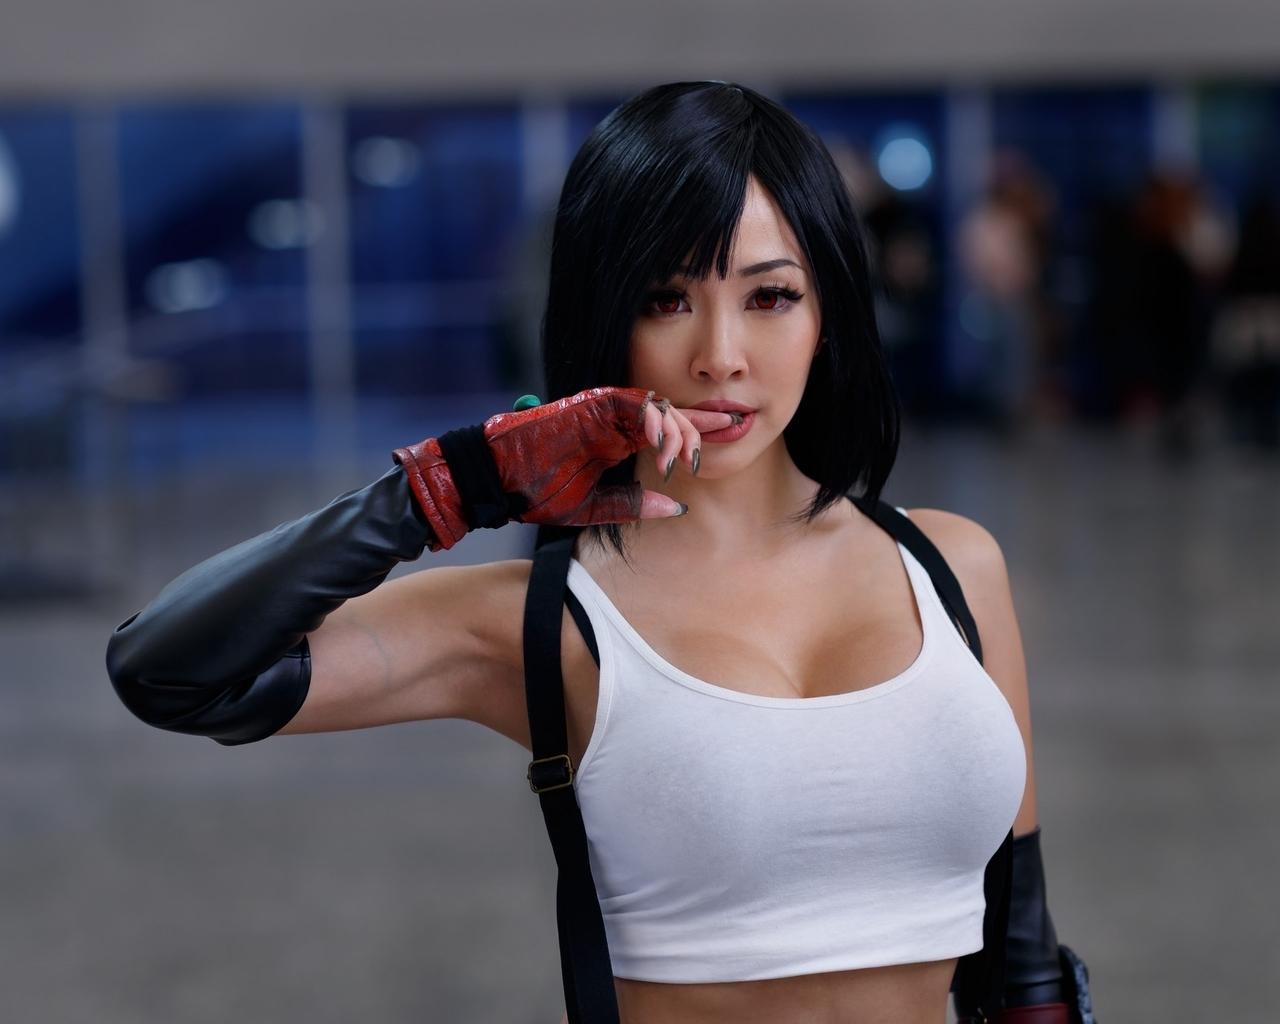 Картинка: Девушка, азиатка, костюм, косплей, Тифа Локхарт, Final Fantasy VII